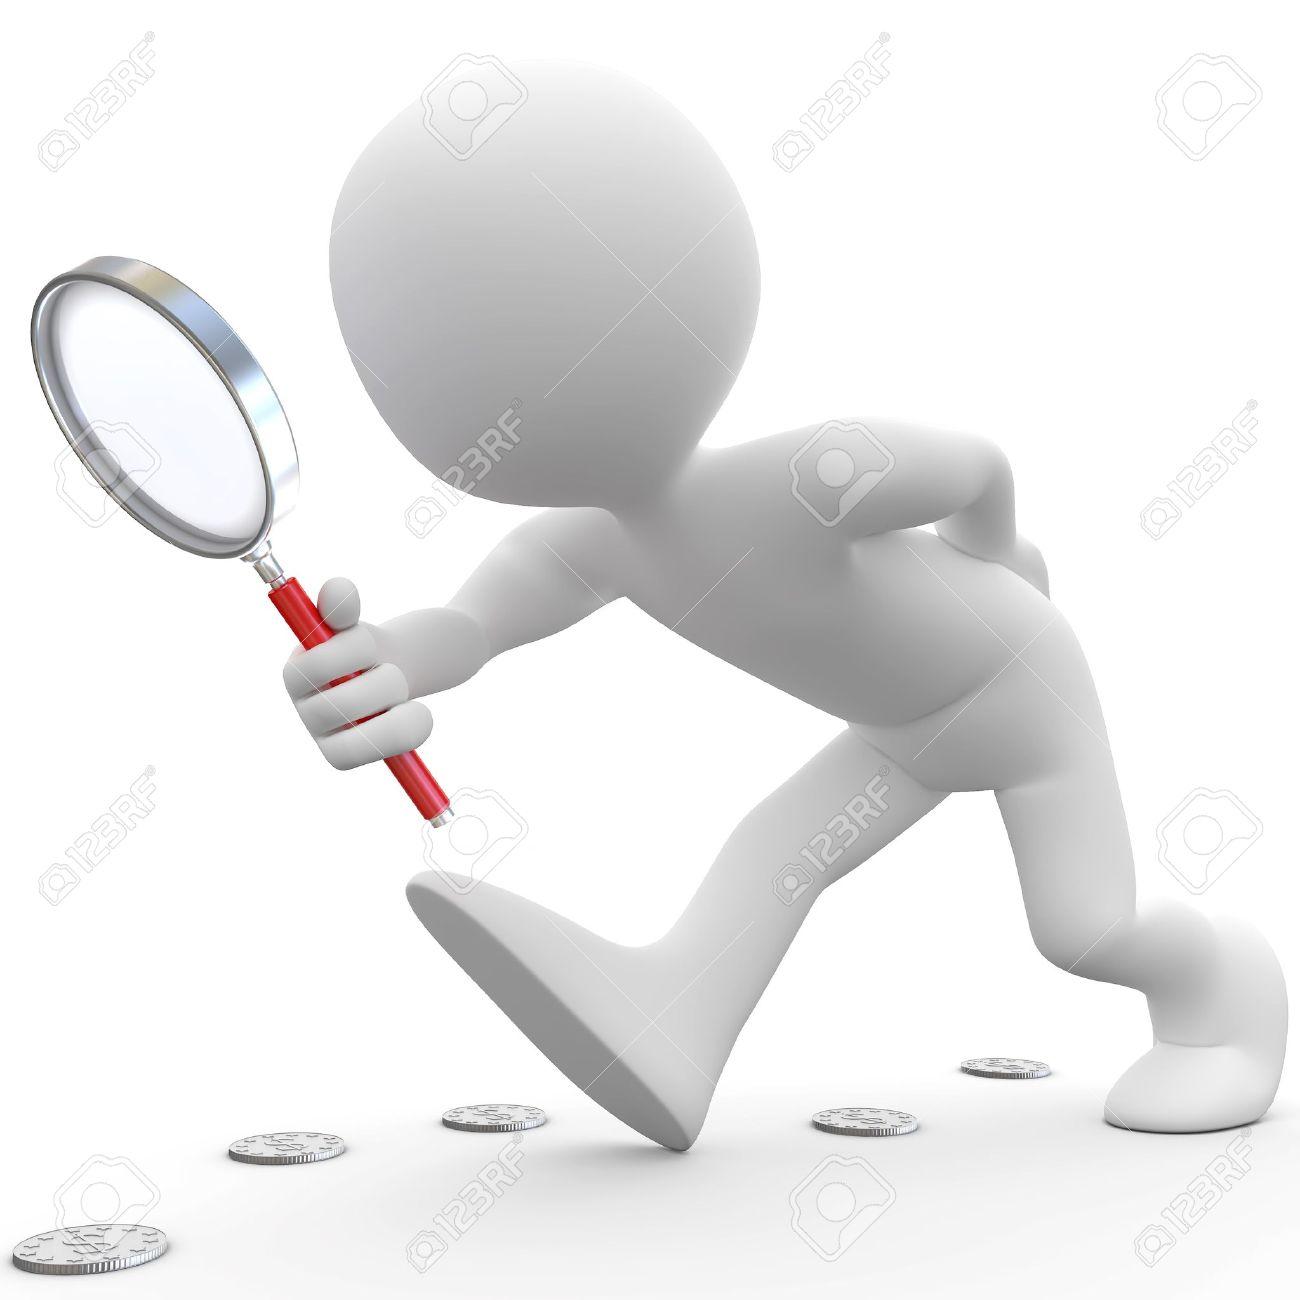 Explore magnifying glass clipart - ClipartFest